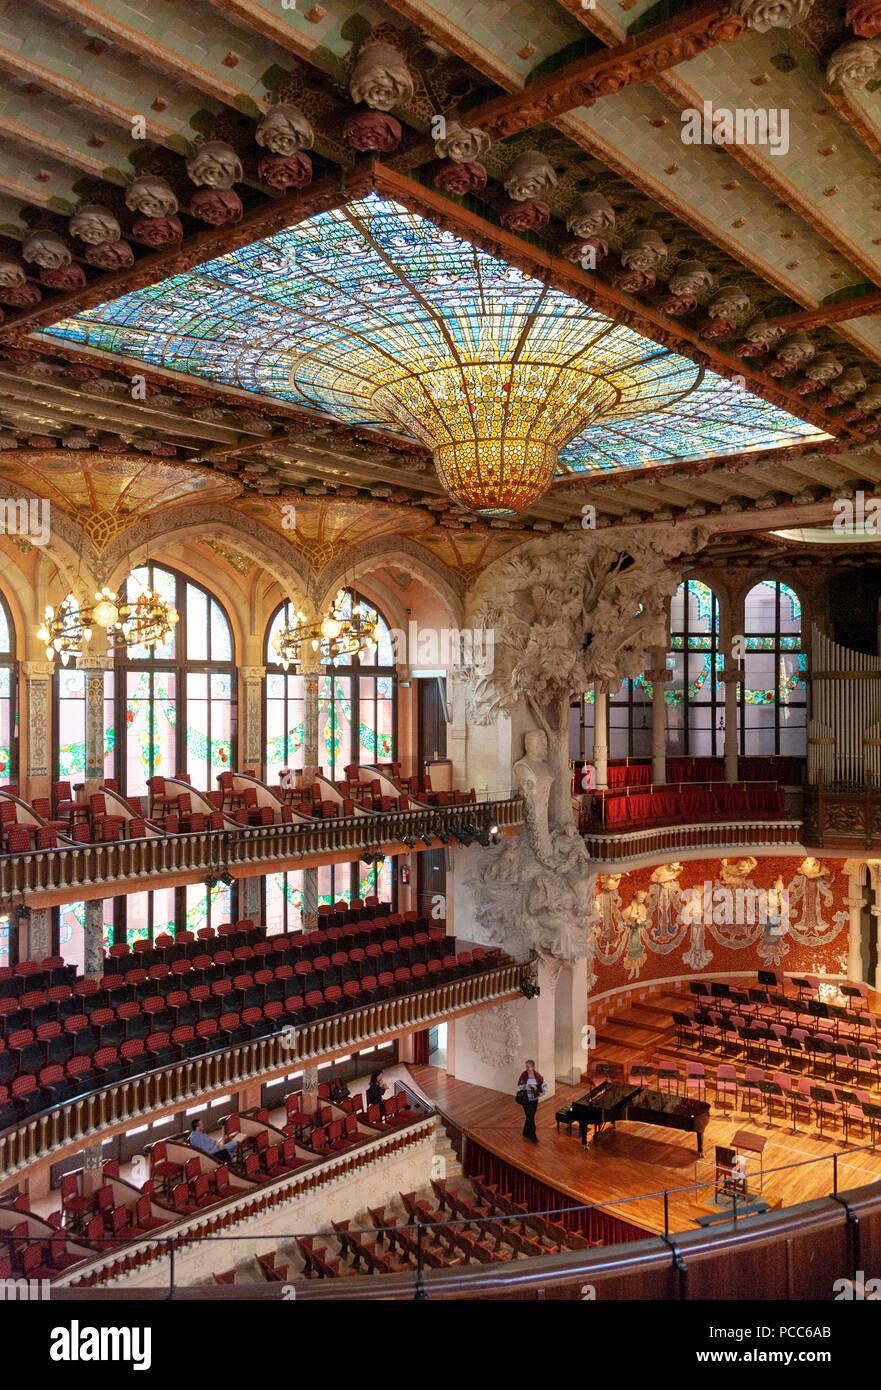 Barcelona, Palau de la Musica Catalana. Modernisme, Palast der katalanischen Musik, Barcelona, Katalonien, Spanien. Erbaut 1905 - 1908 von Lluis Domen - Stock Image